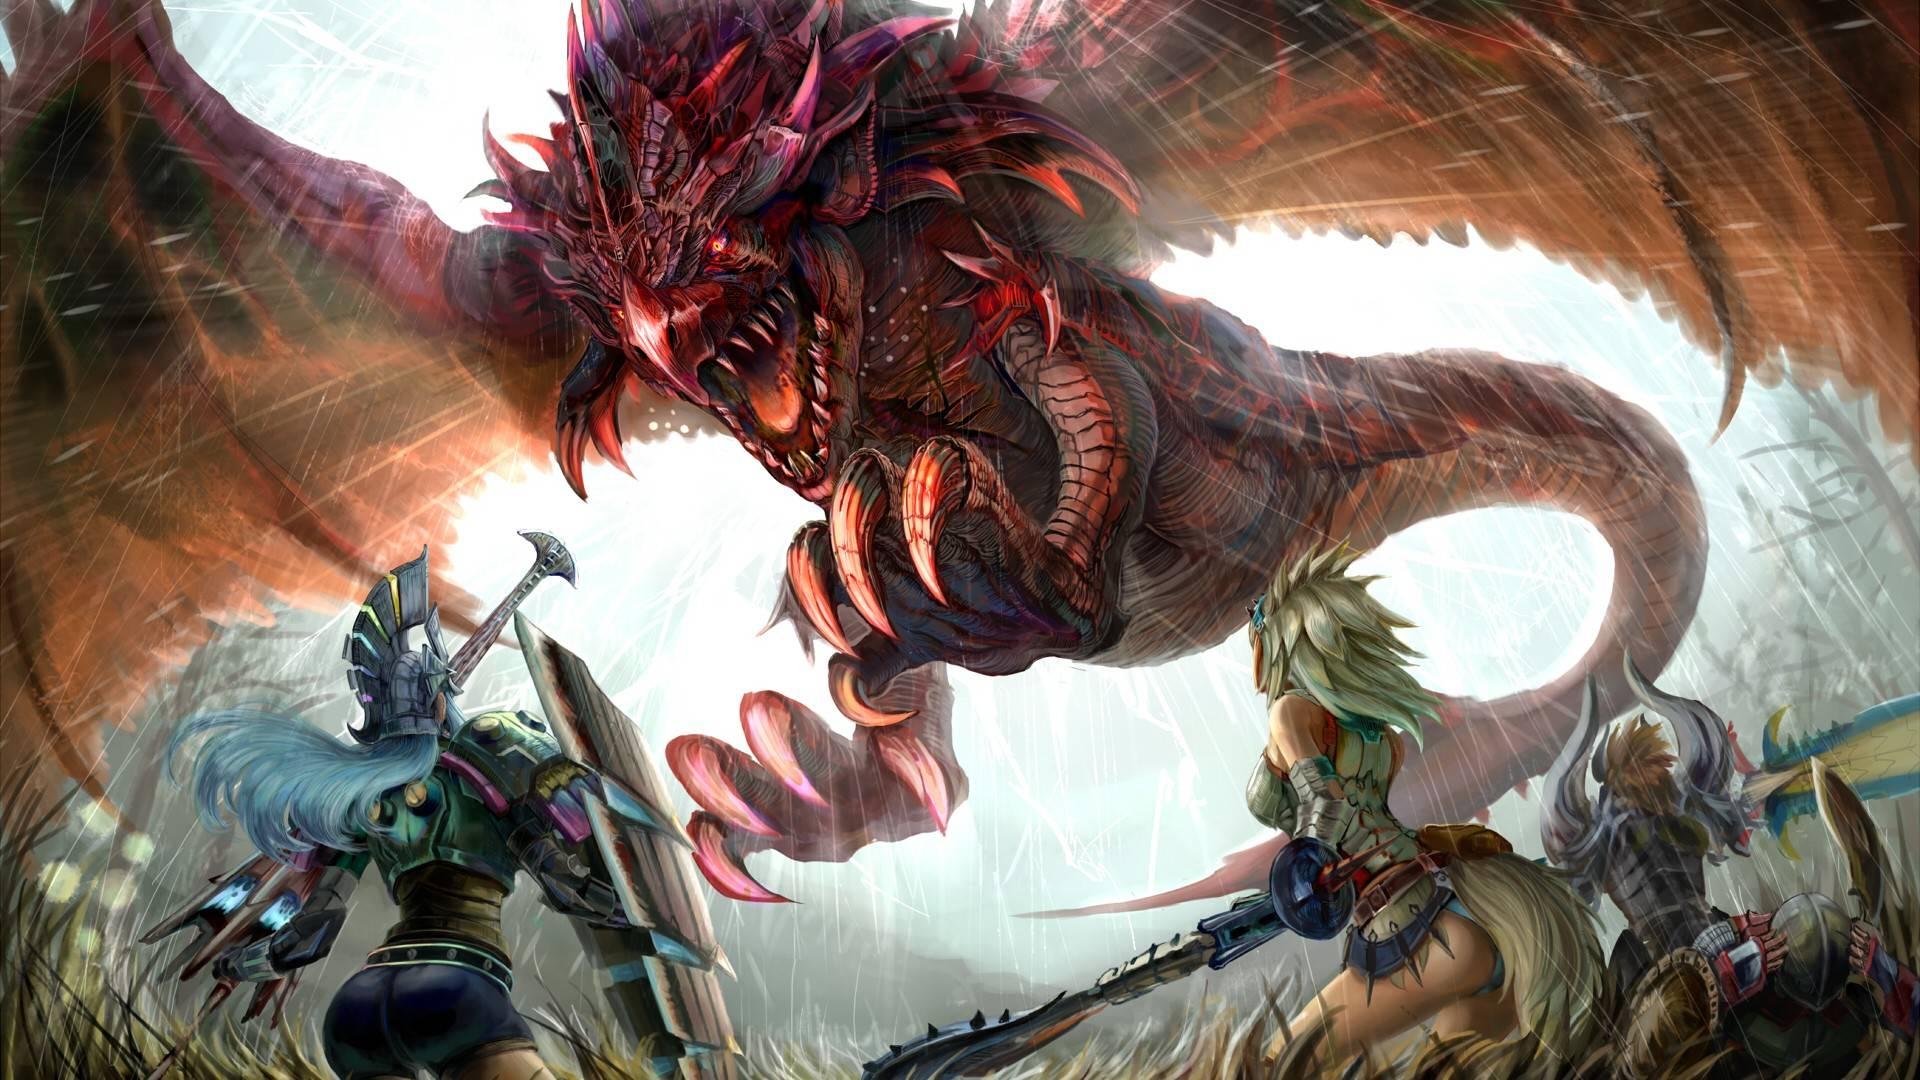 dragao-vs-guerreiras